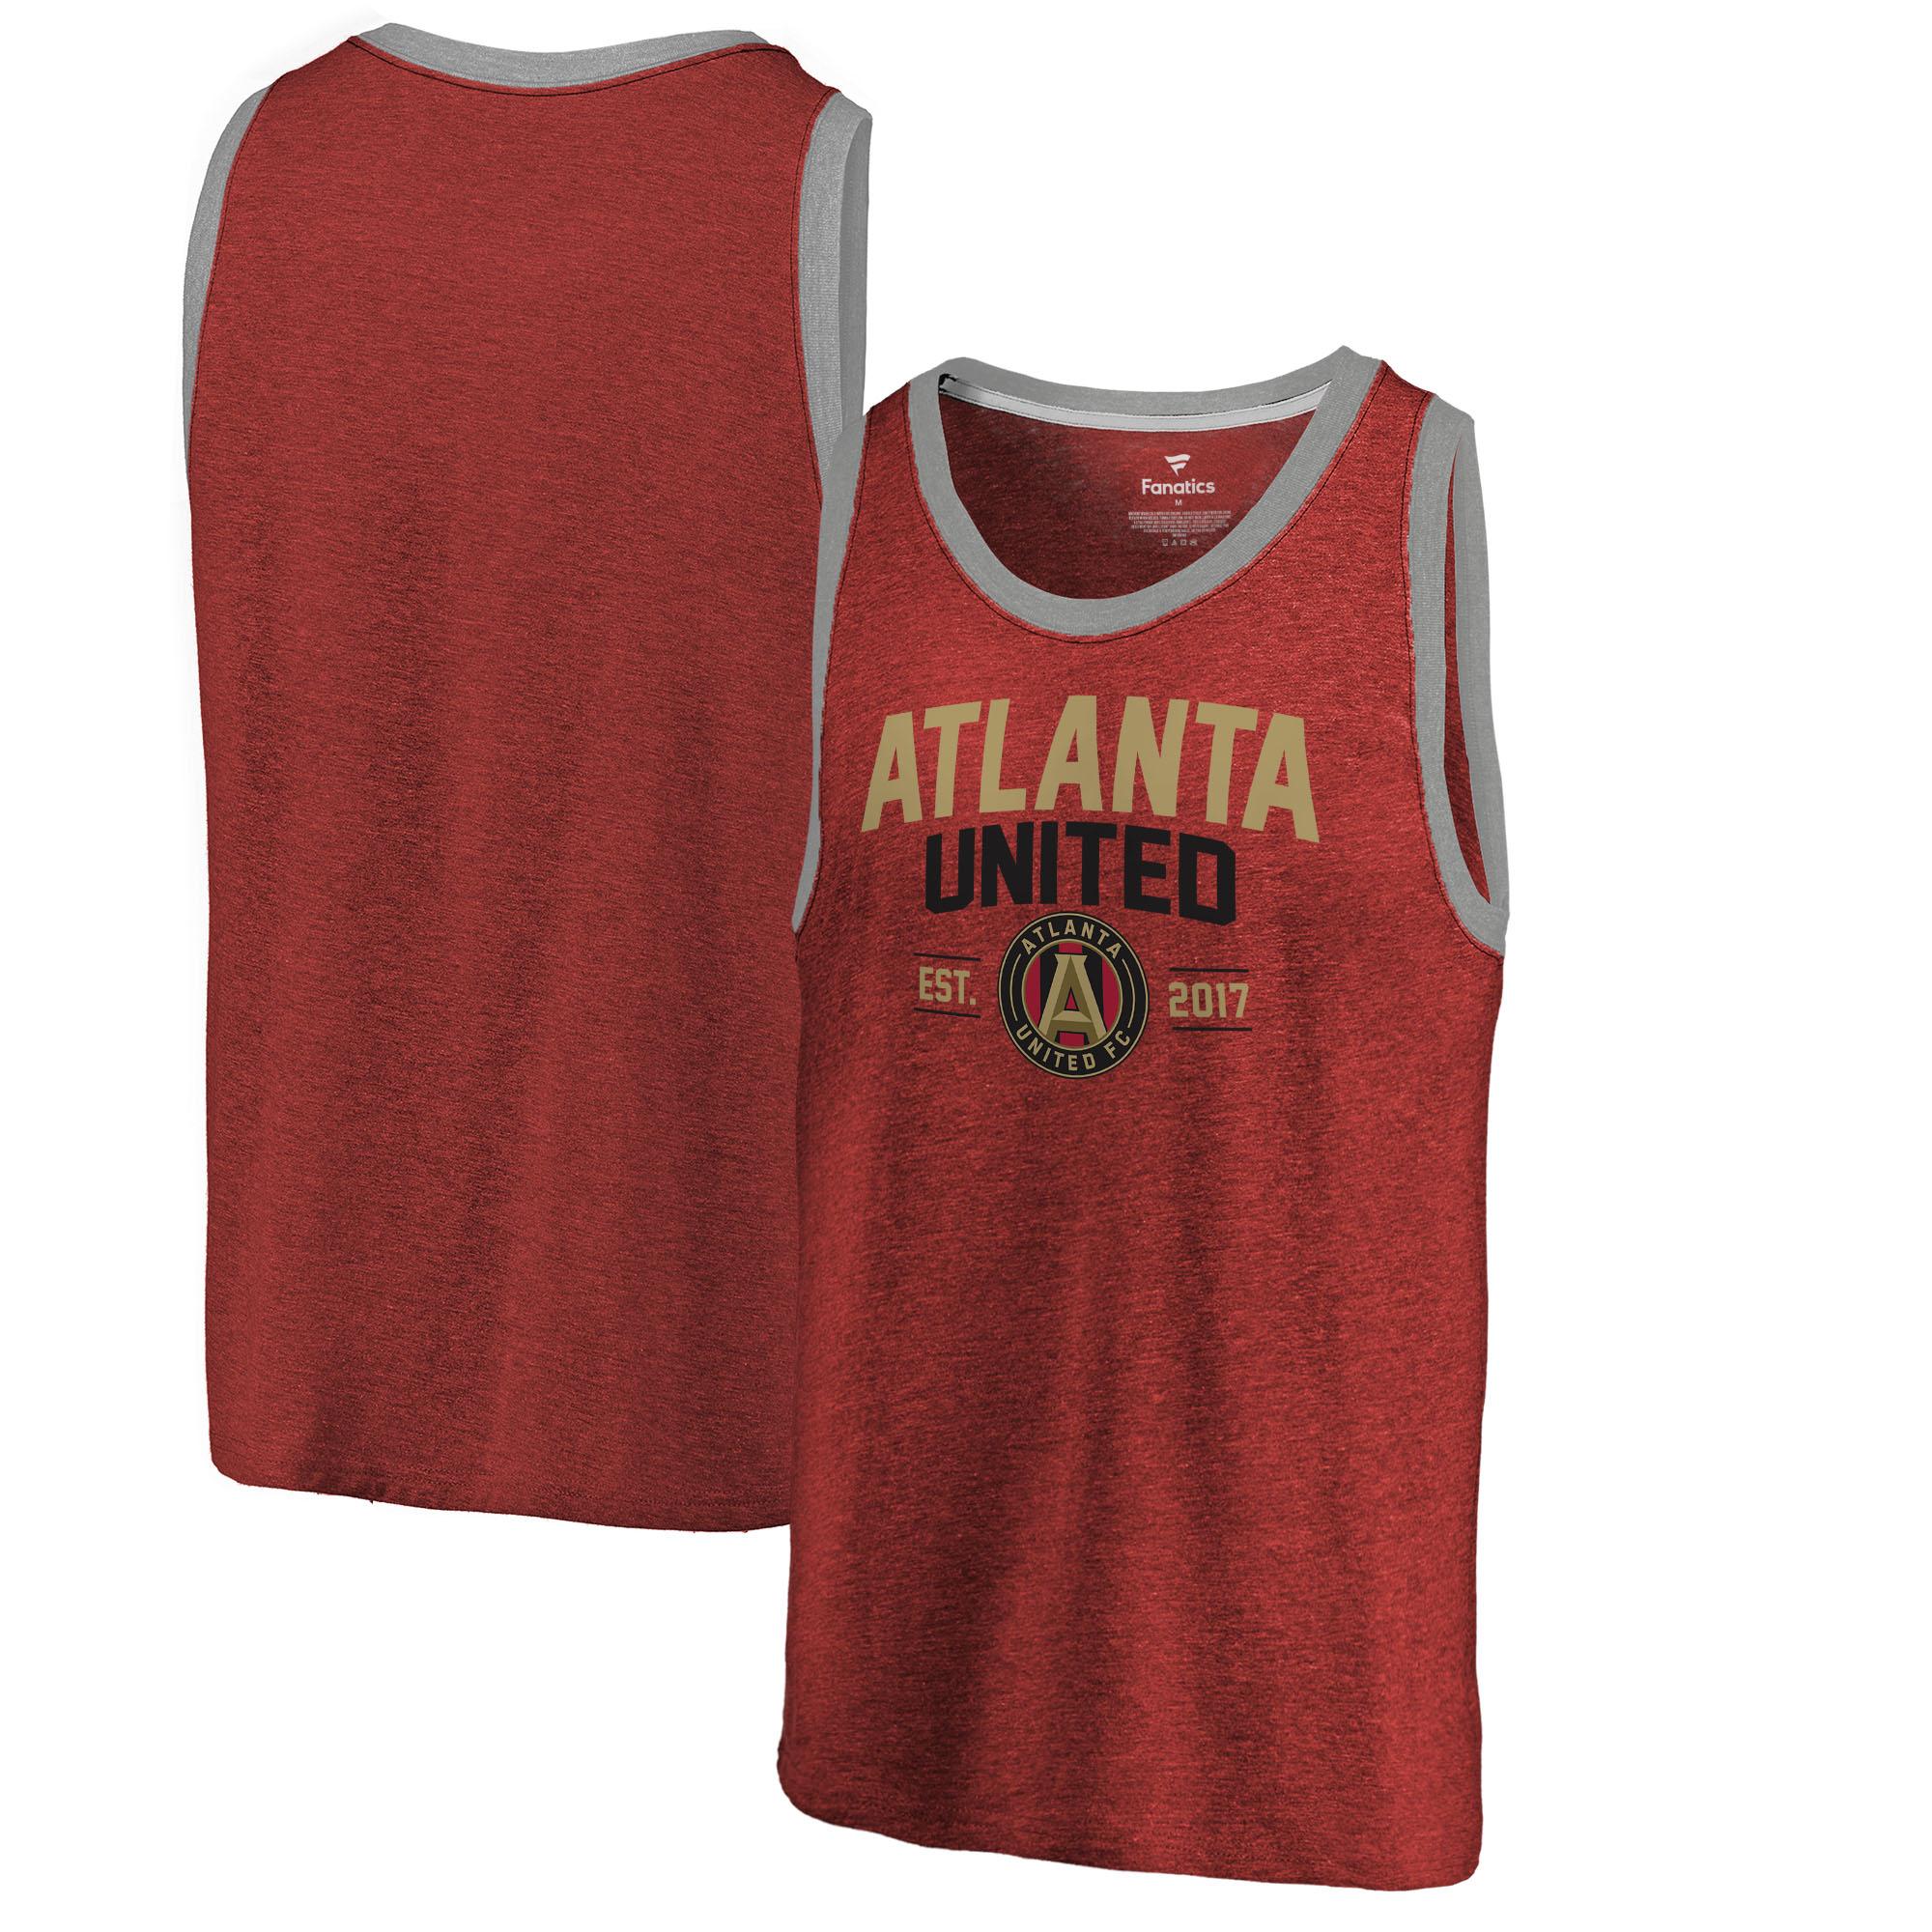 Atlanta United FC Fanatics Branded Tri-Blend Tank Top - Red